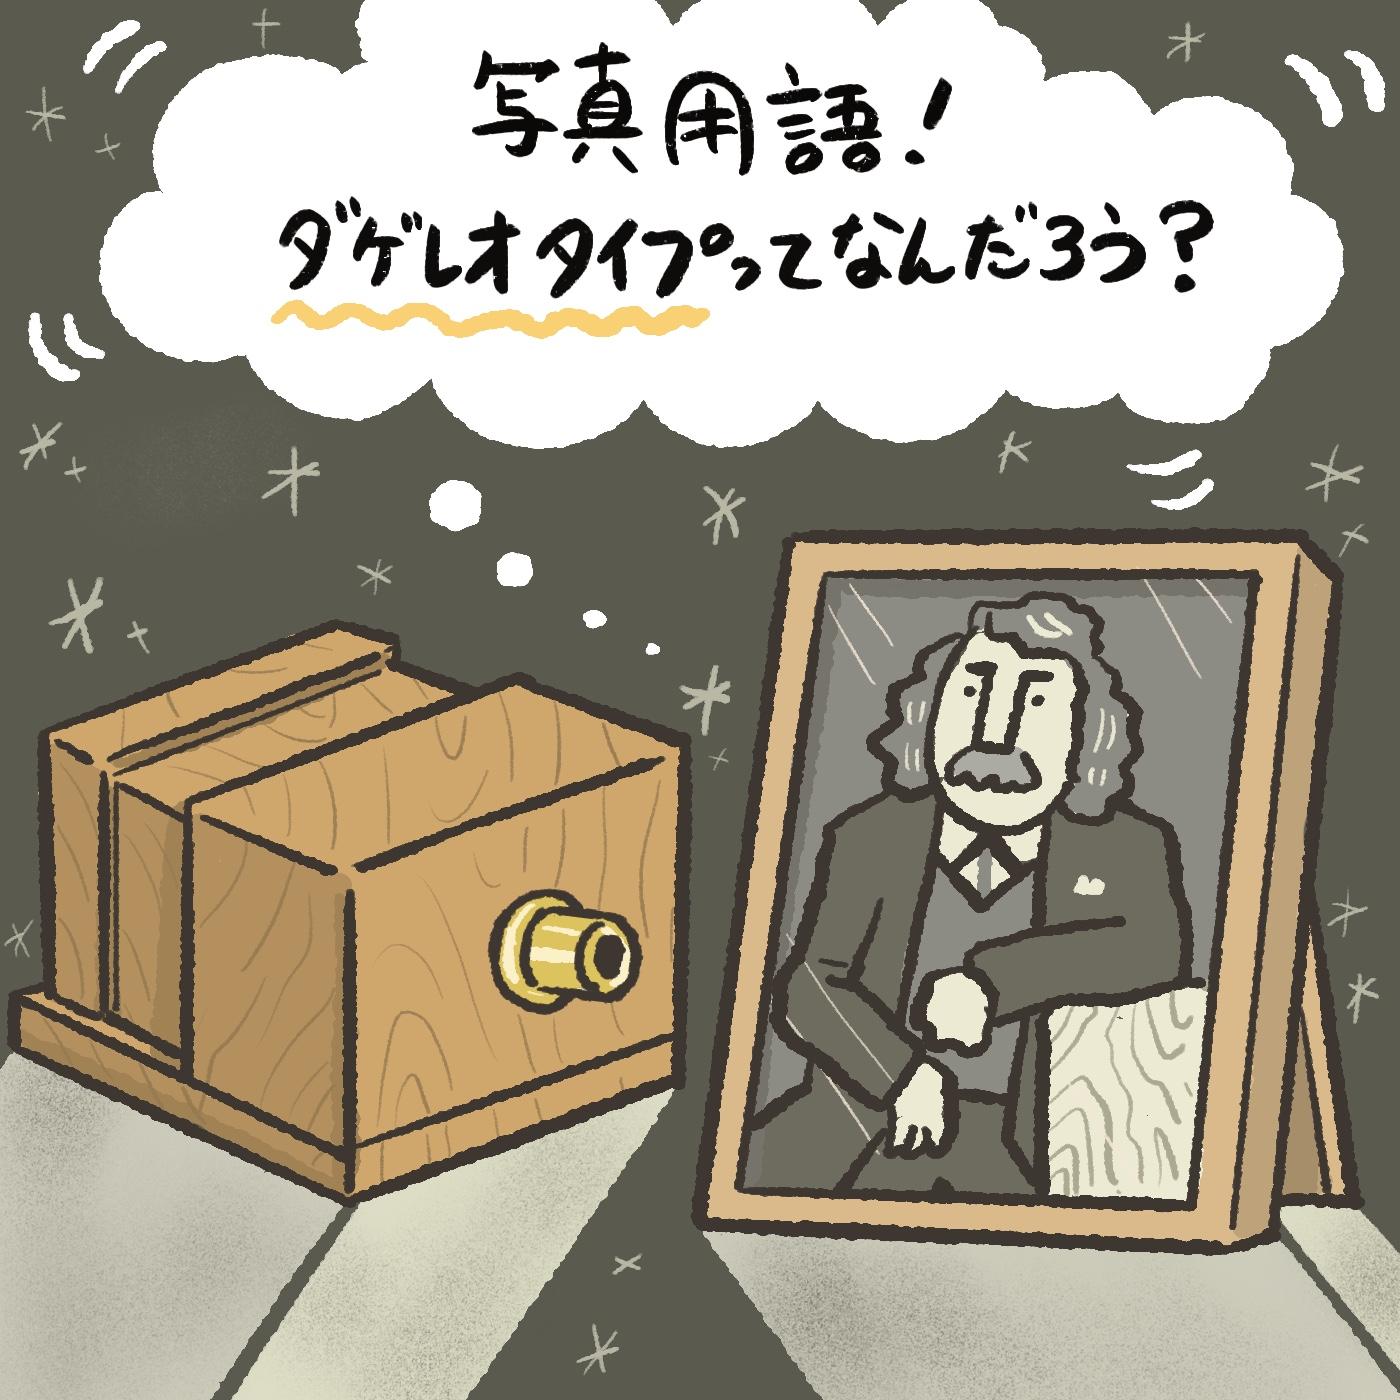 OBIKAKE ナニソレ タゲレオタイプ 藤野遼太